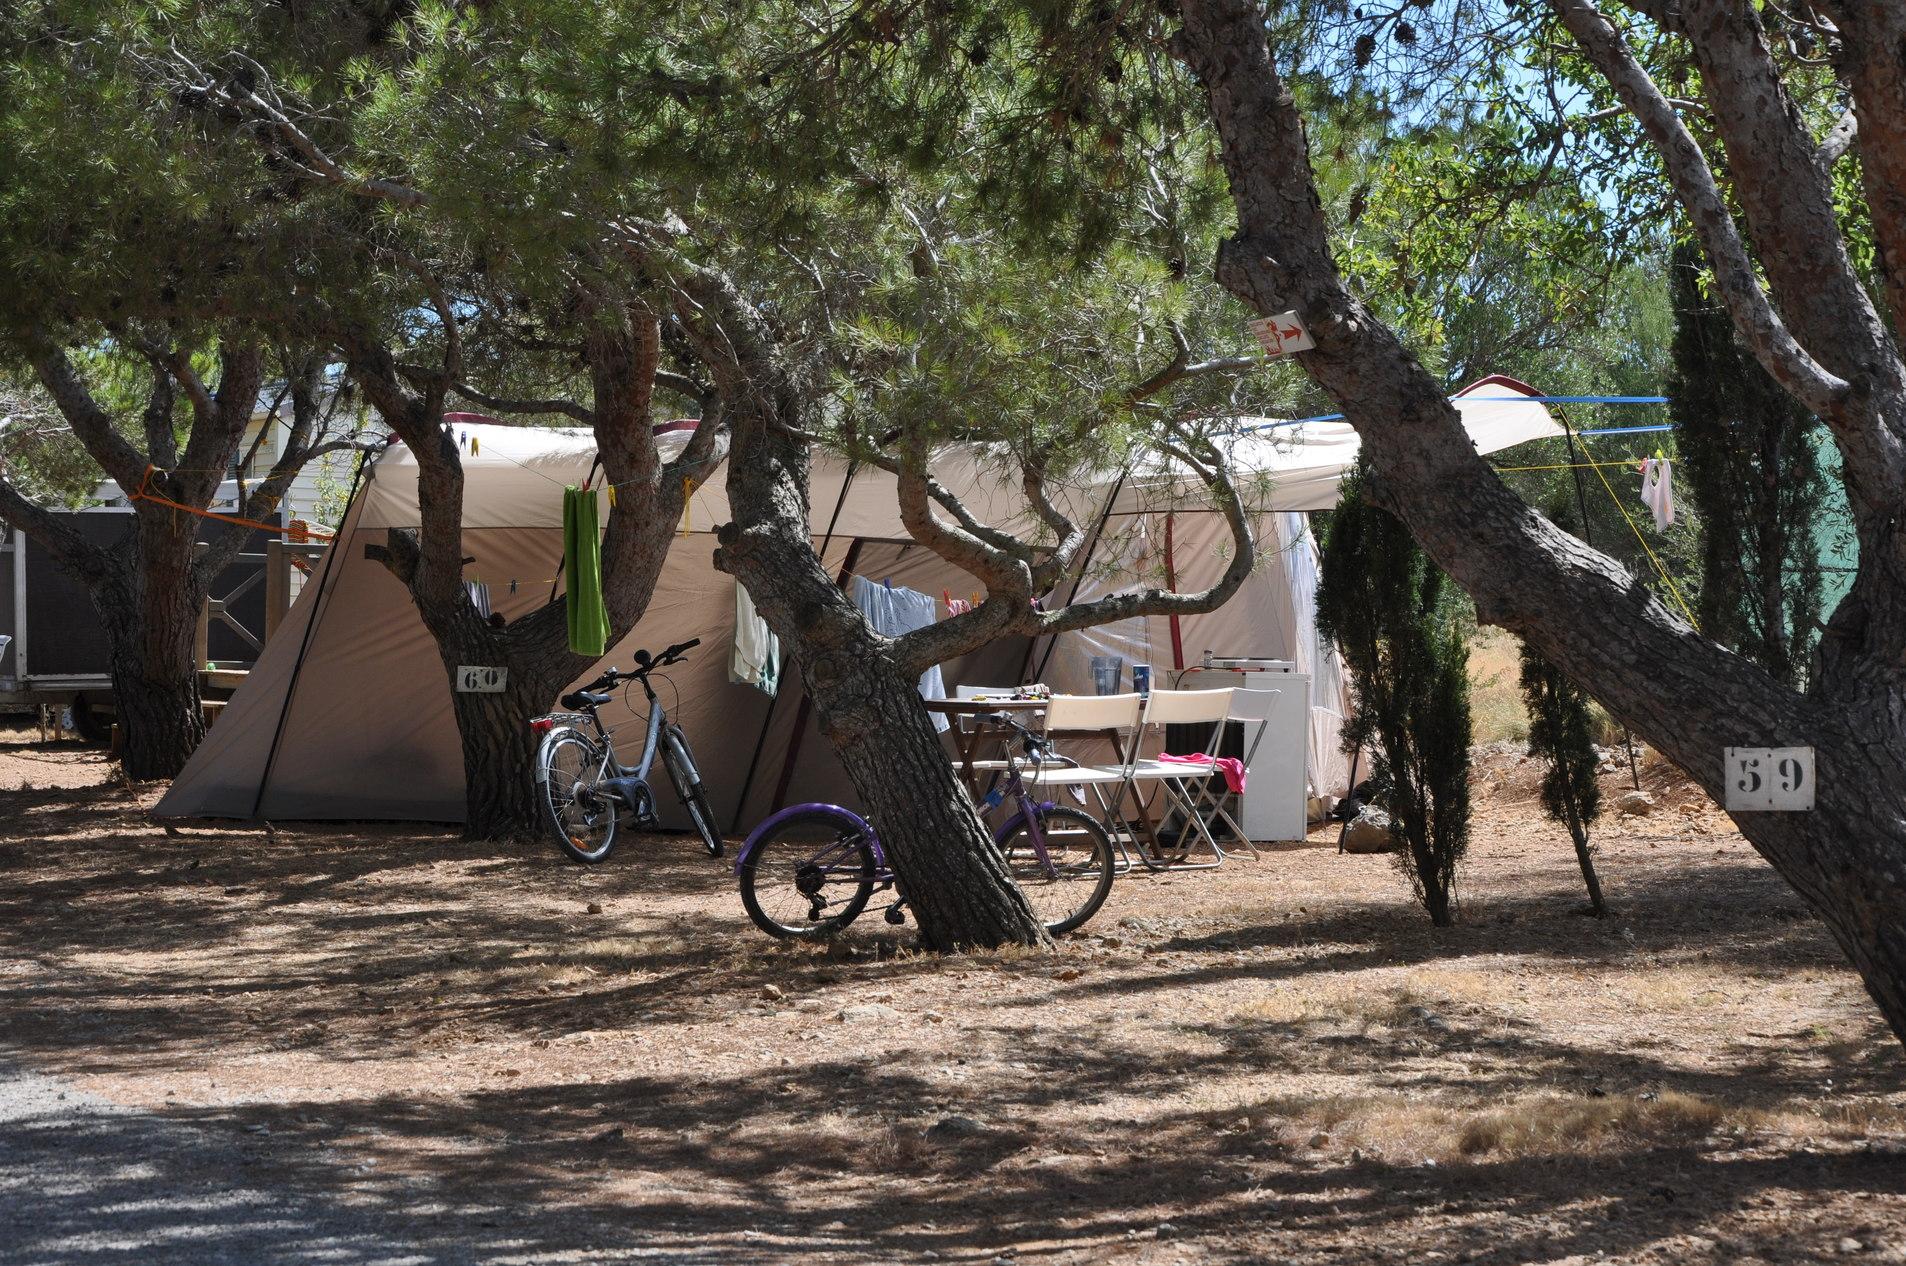 Frankrijk-Fitou-Camping%20Le%20Fun-ExtraLarge Wintersport Frankrijk Pagina 9 van 55